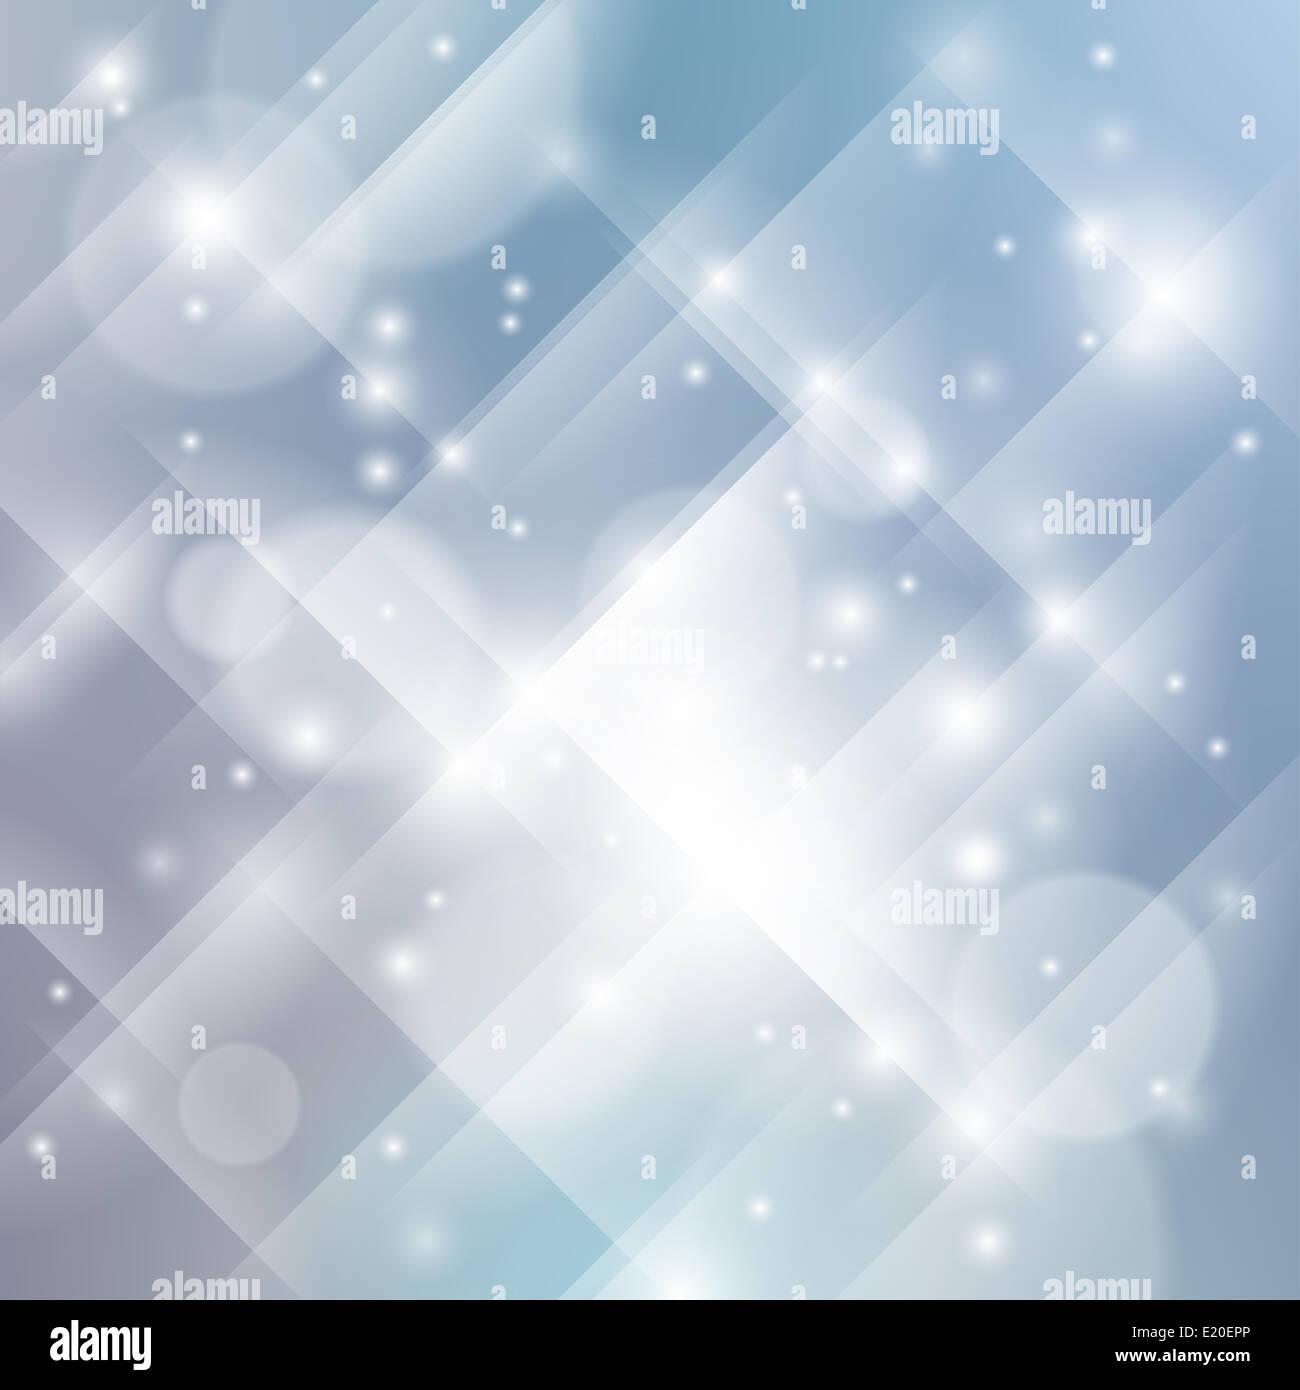 Gentle background - Stock Image